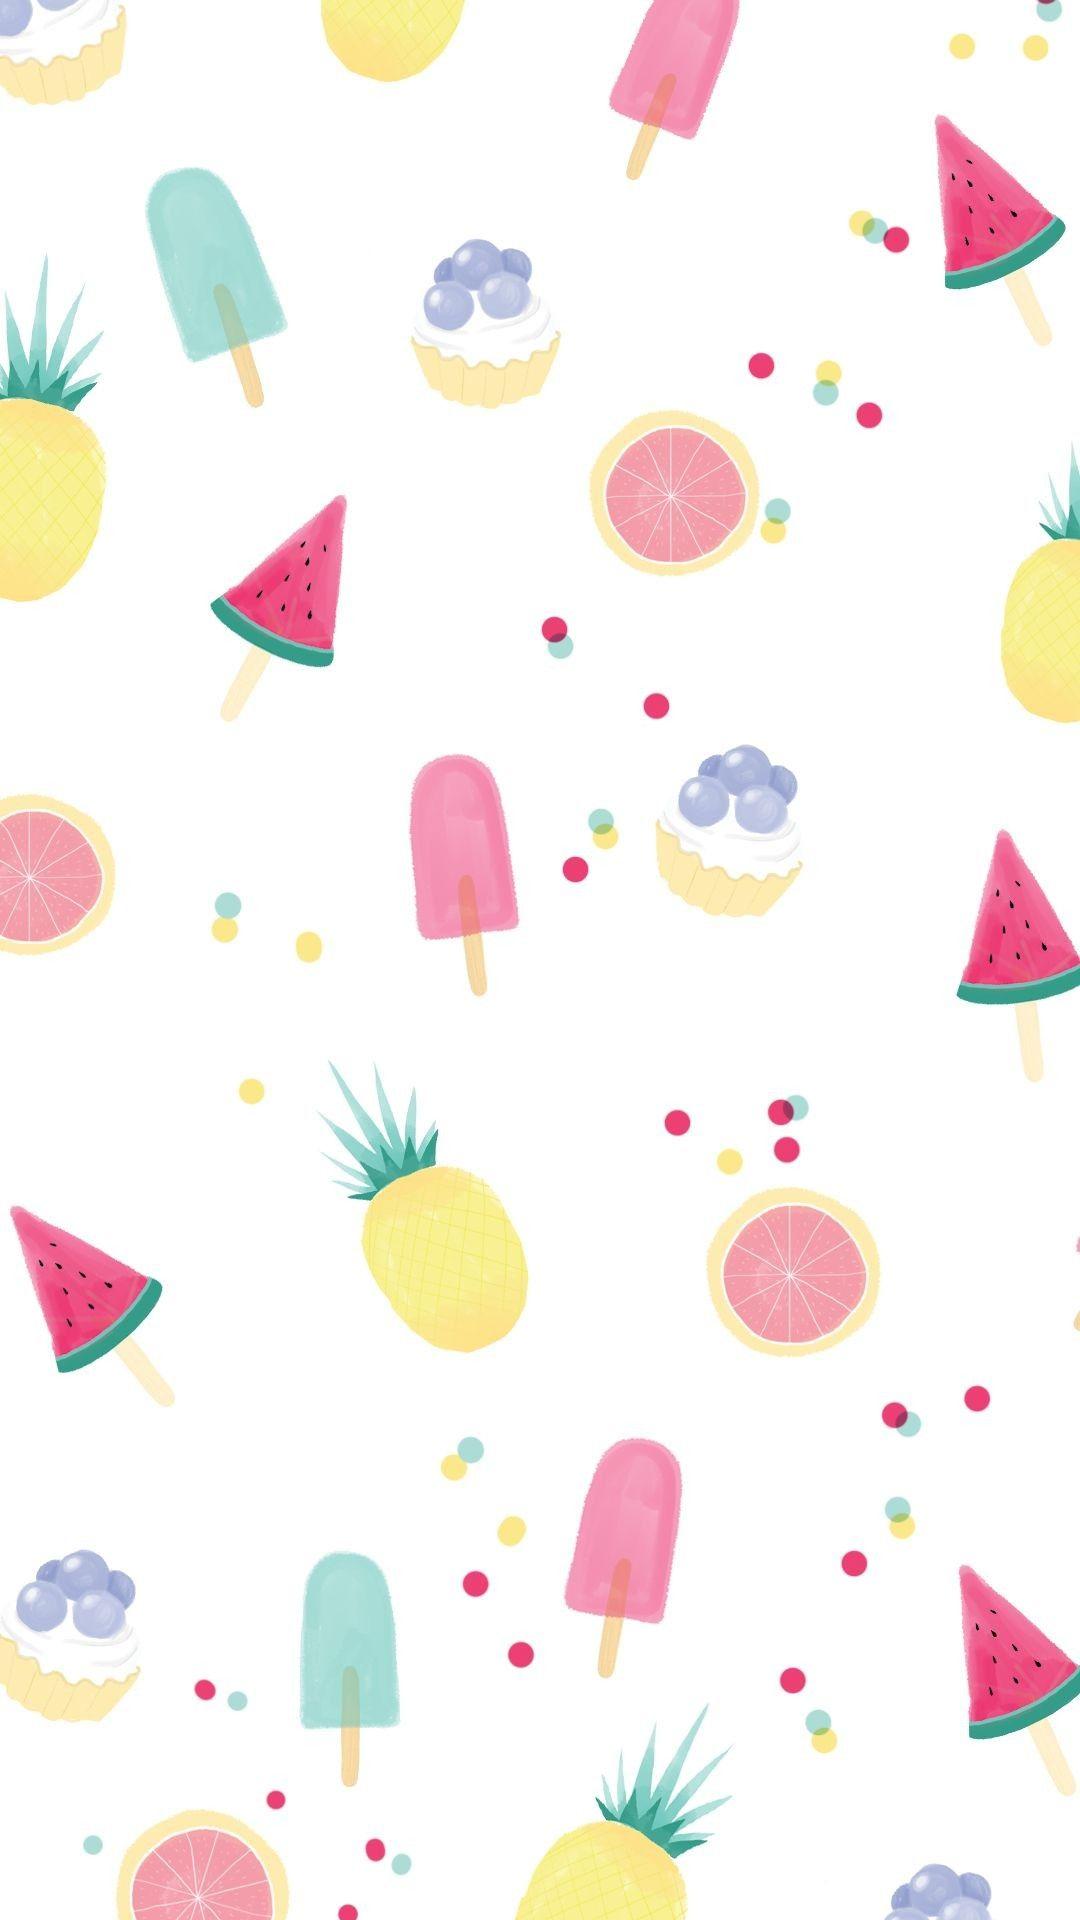 Summer Starbucks Android Background Wallpaper Iphone Summer Hipster Wallpaper Summer Wallpaper